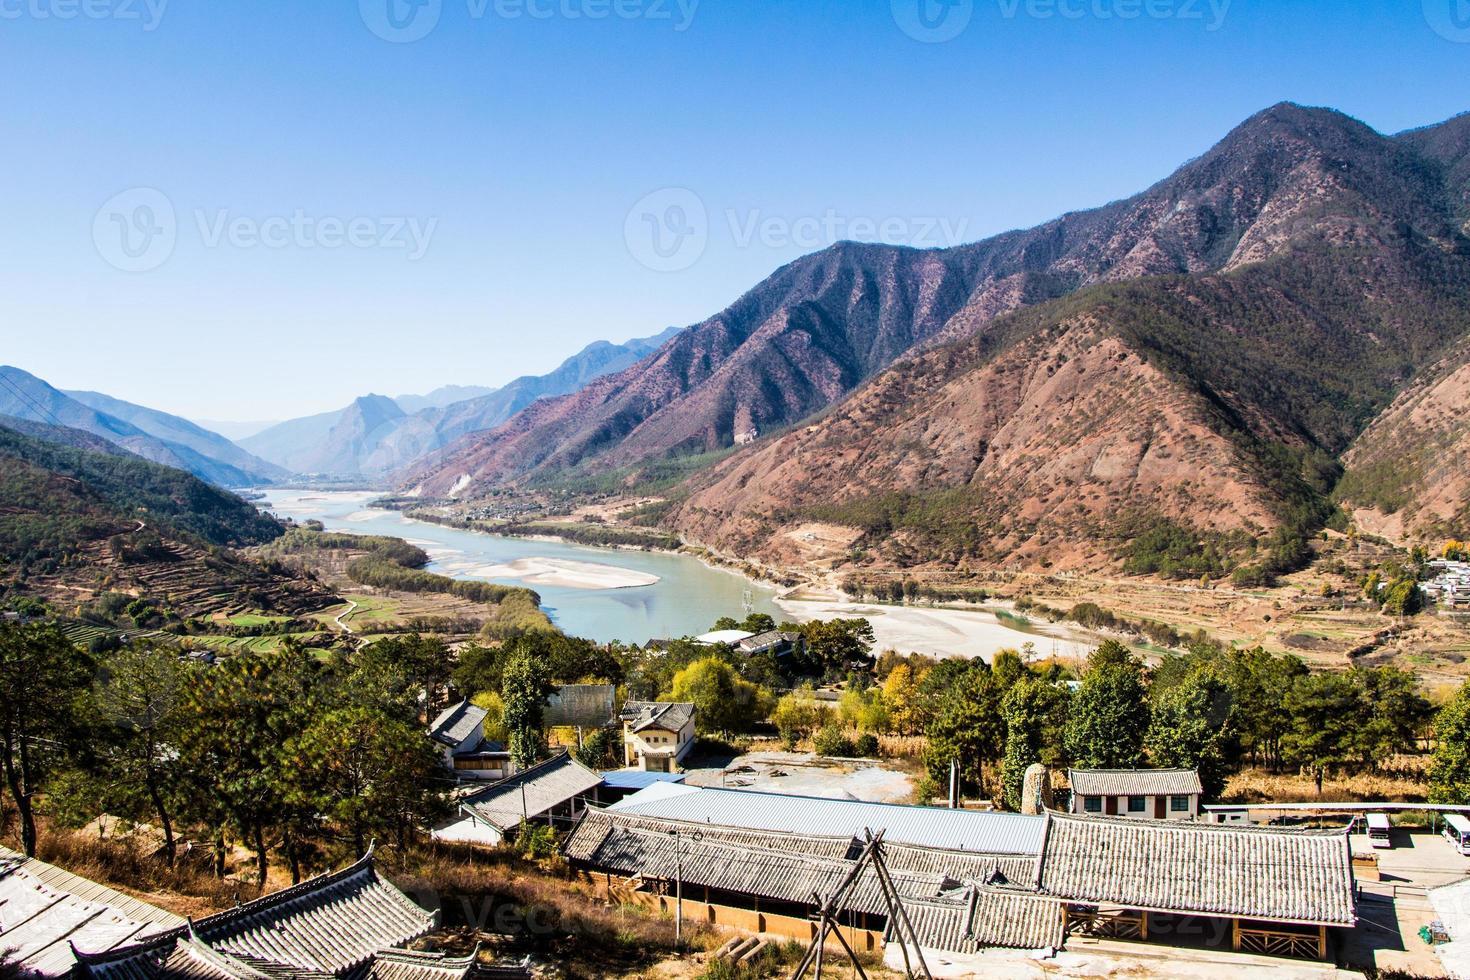 fiume yangtze prima curva foto